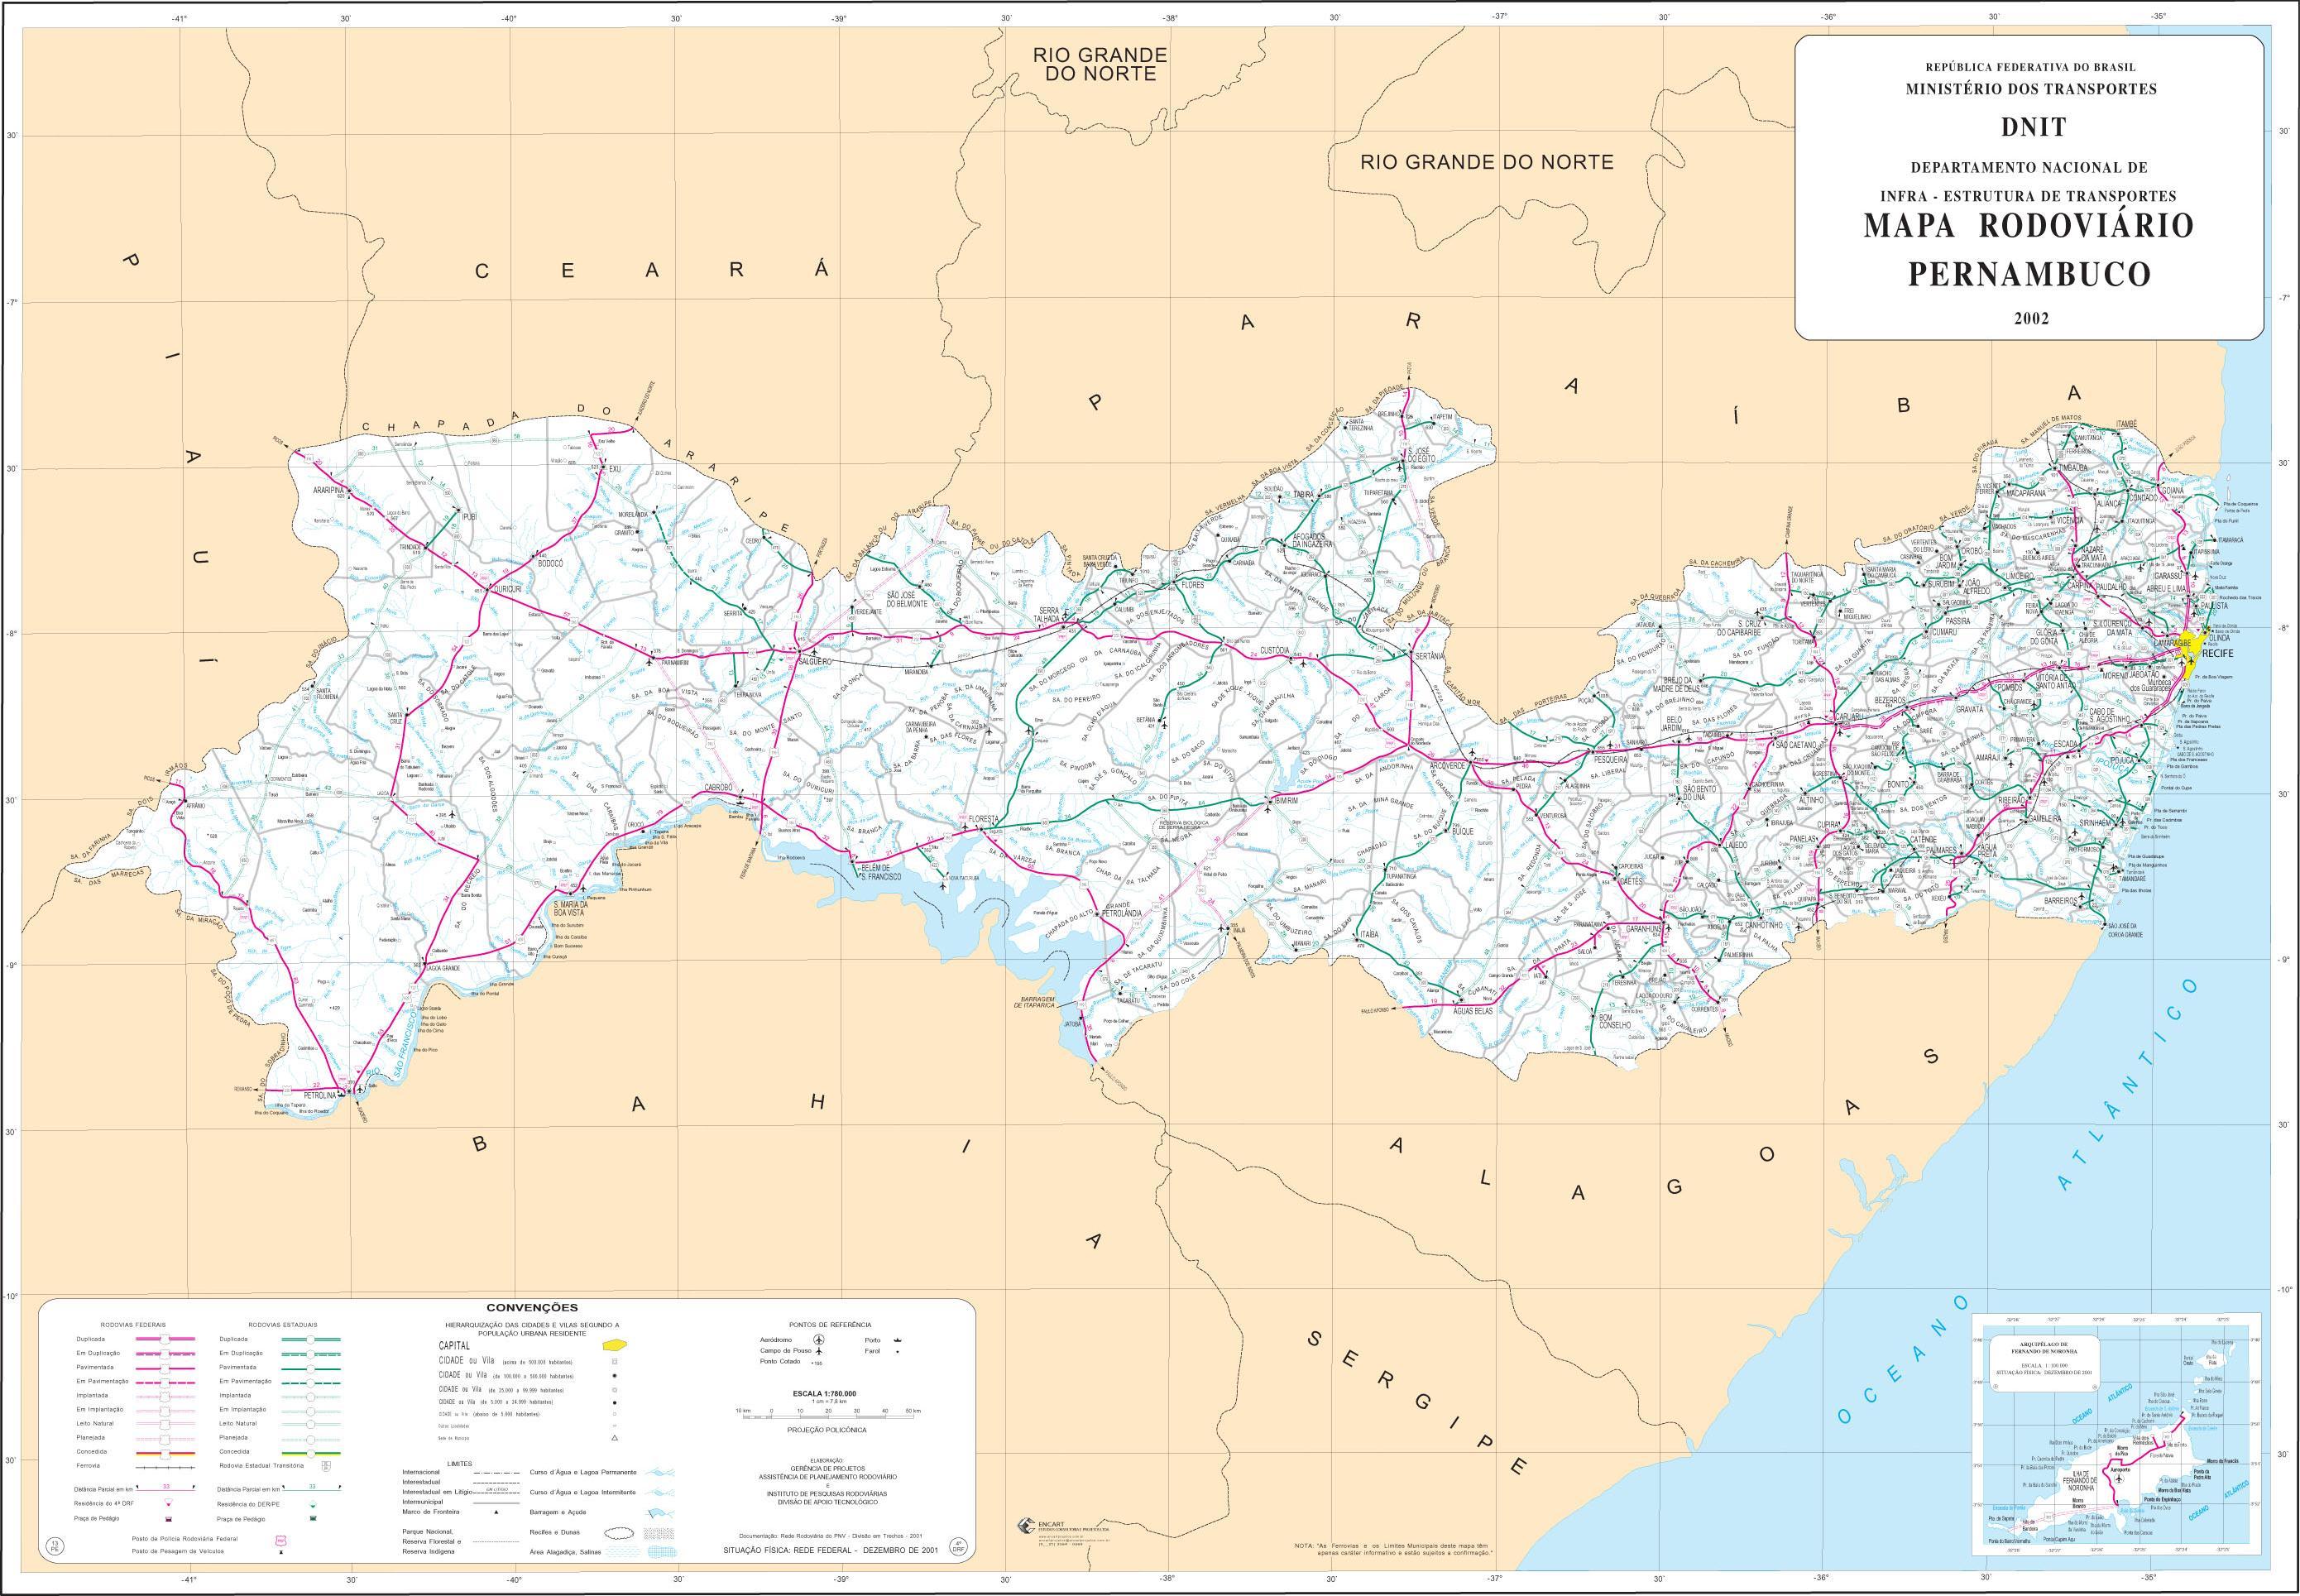 Pernambuco State Road Map, Brazil